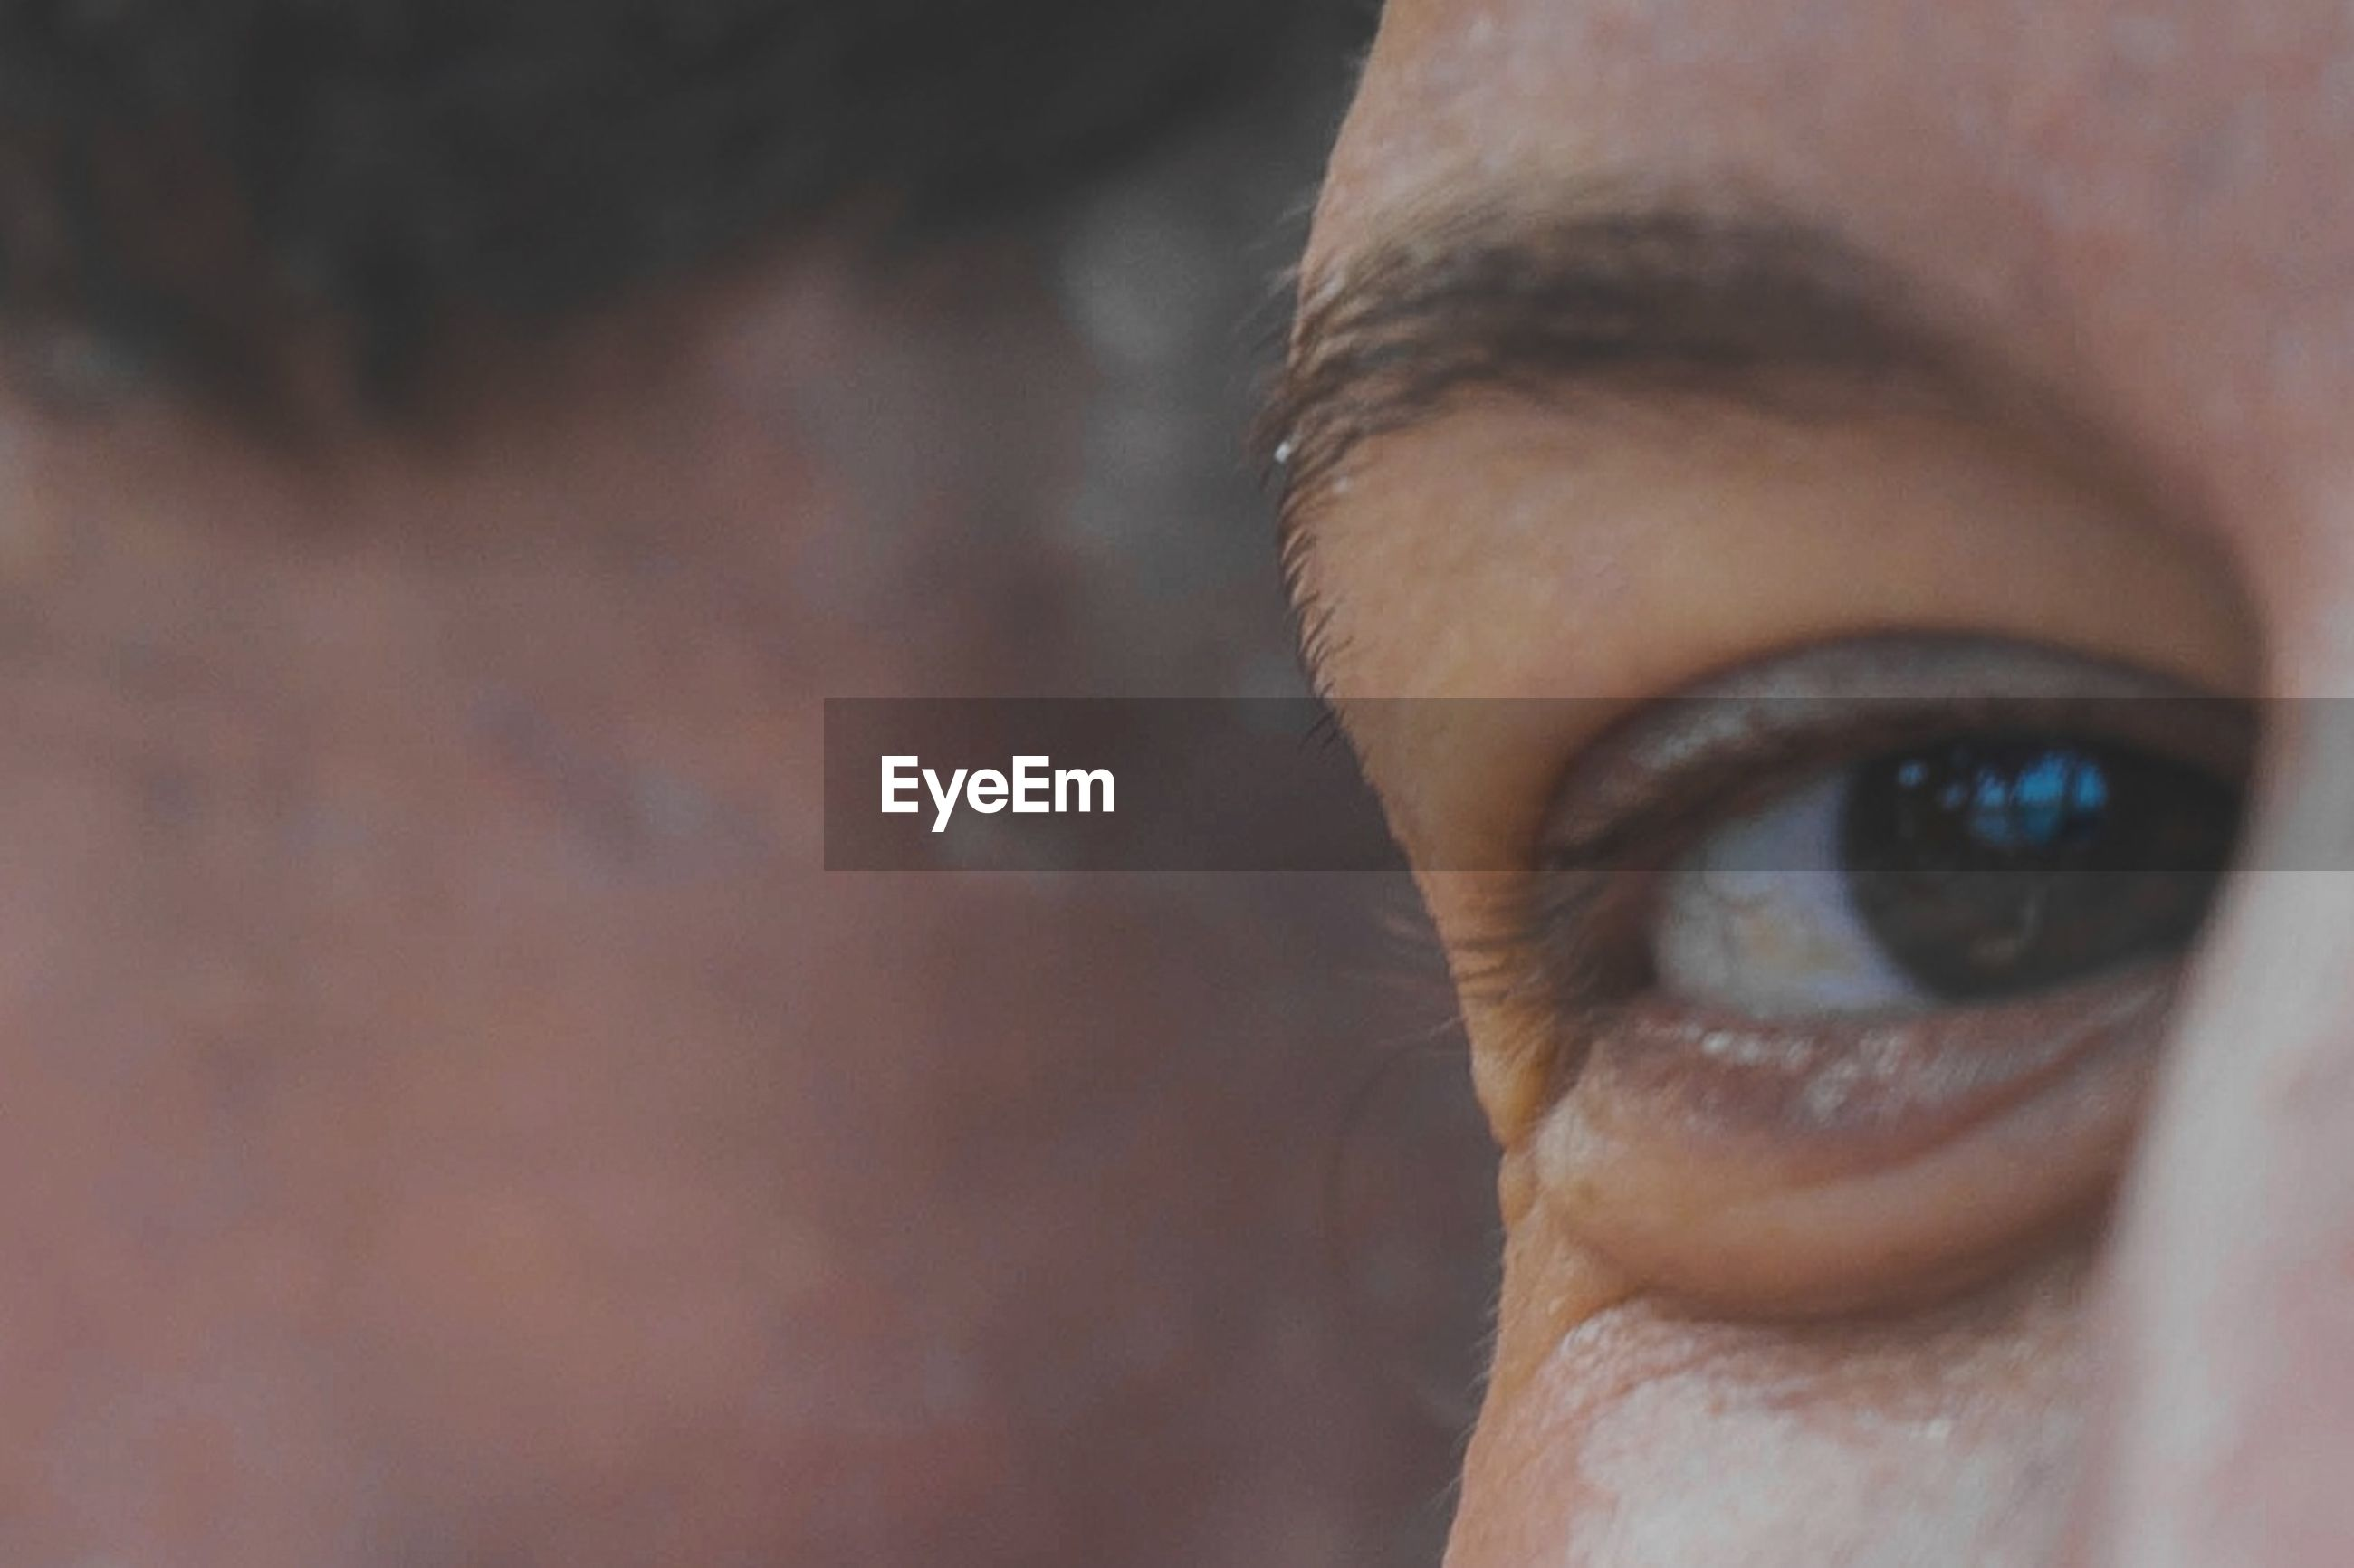 human eye, human body part, one person, eyelash, real people, close-up, sensory perception, human skin, portrait, looking at camera, eyesight, eyeball, human face, day, outdoors, people